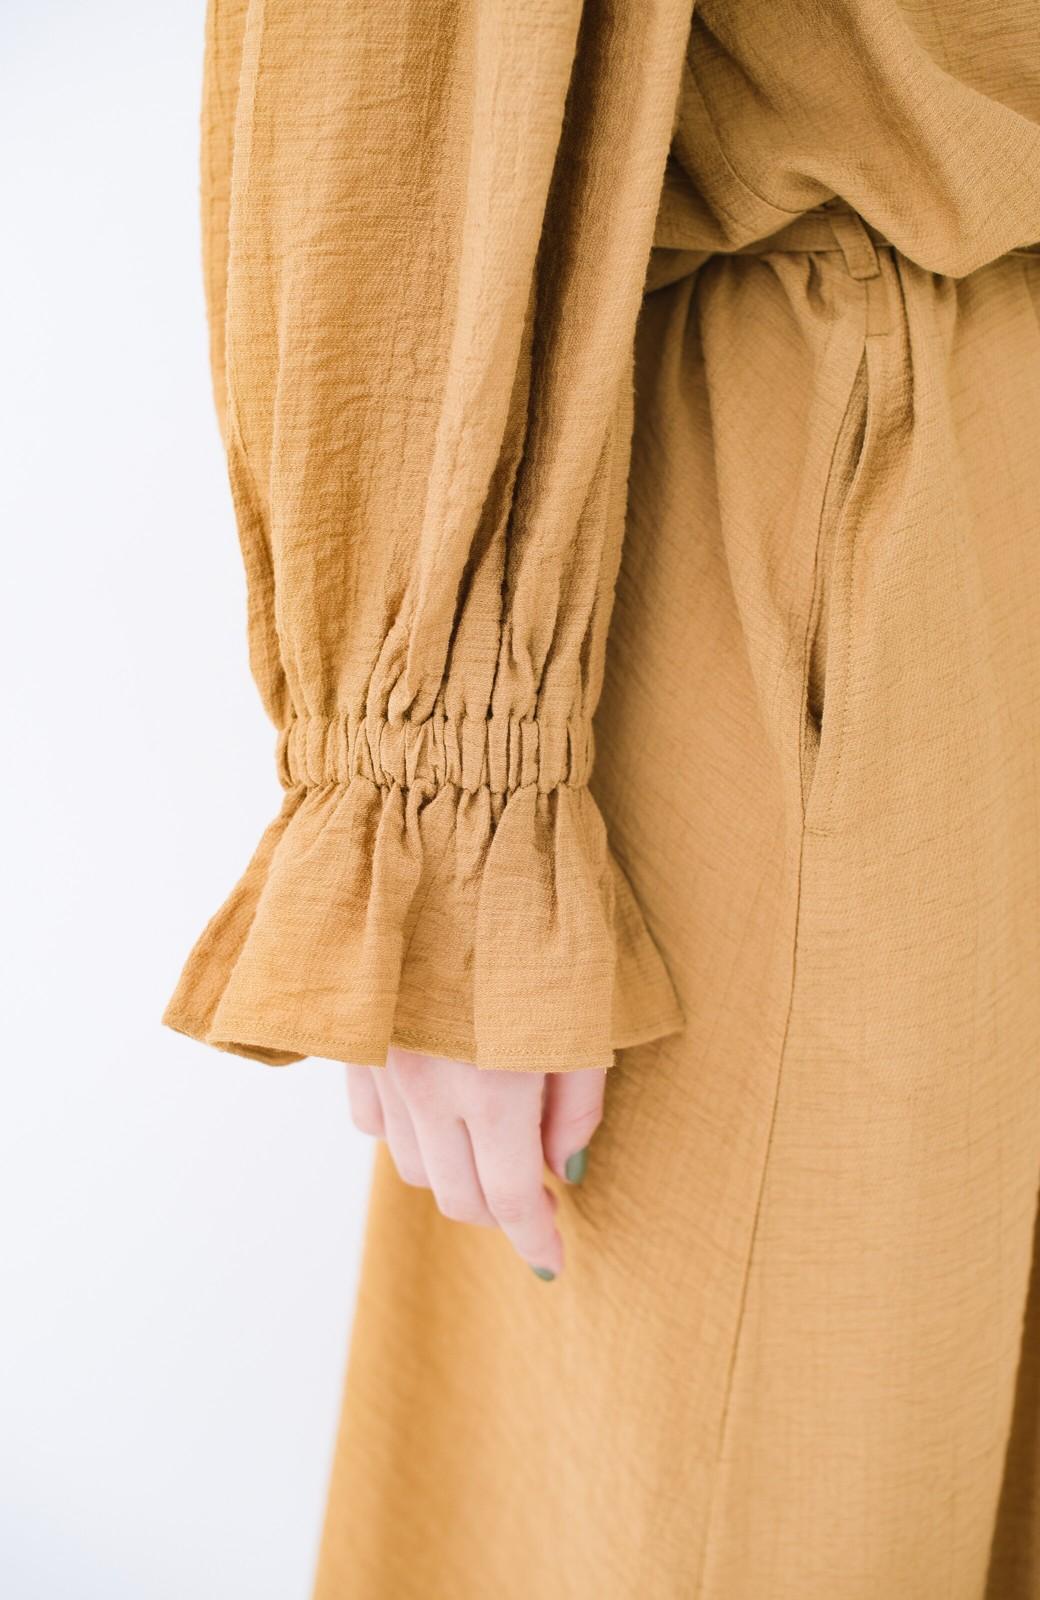 haco! 太ってもばれず 羽織っても便利なウエストリボンワンピース <マスタード>の商品写真7